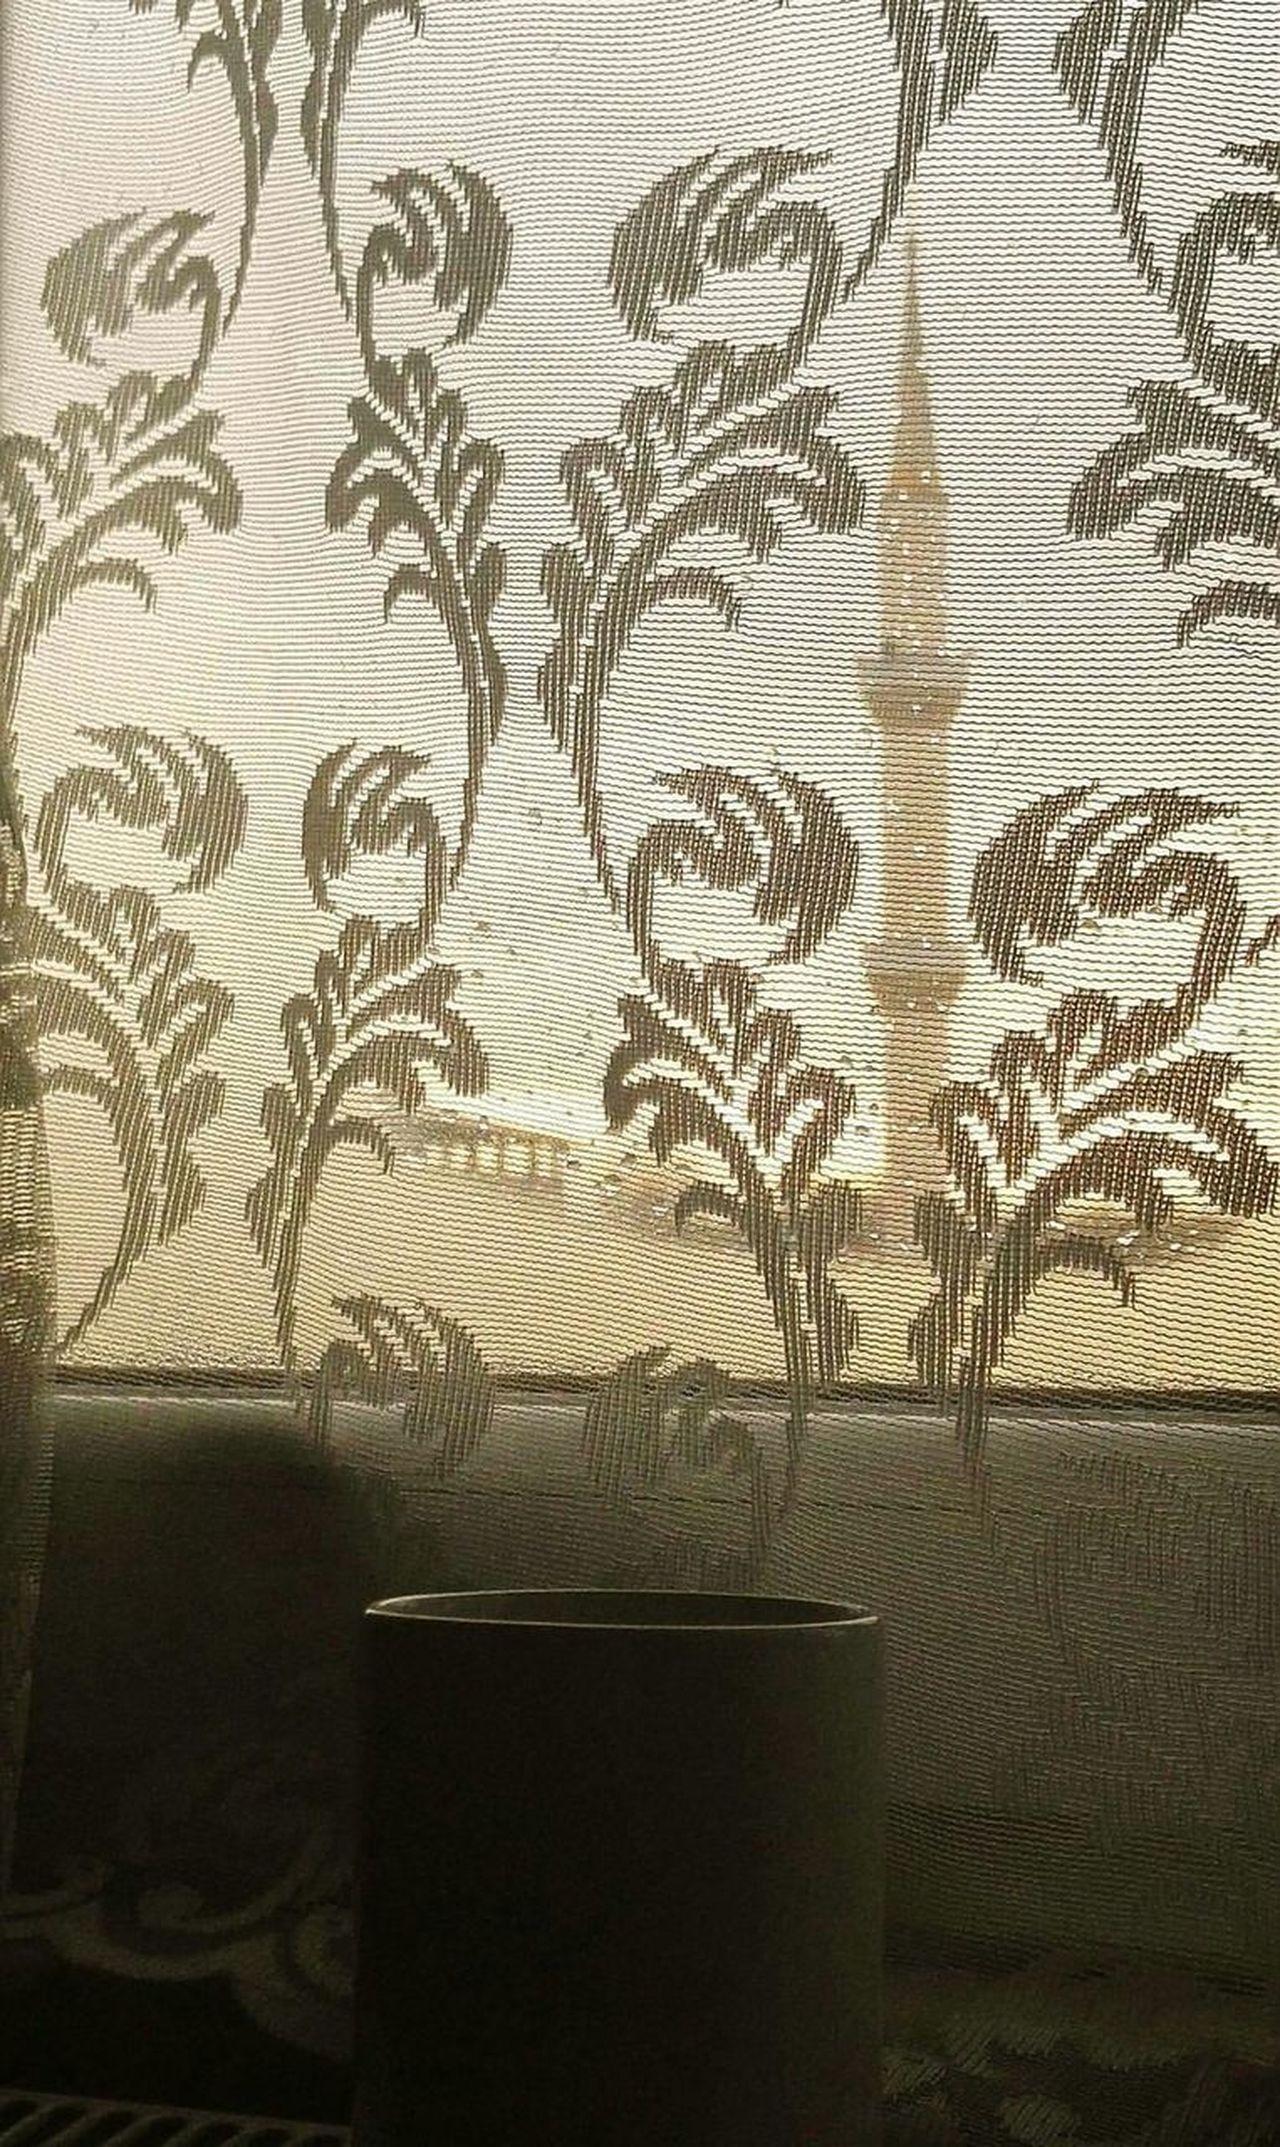 EyeEmNewHere Pencere Window Perde Cami Bardak Kupa Yağmur Pattern Indoors  No People Close-up Nature Day April NİSAN Nisanyagmuru Turkey